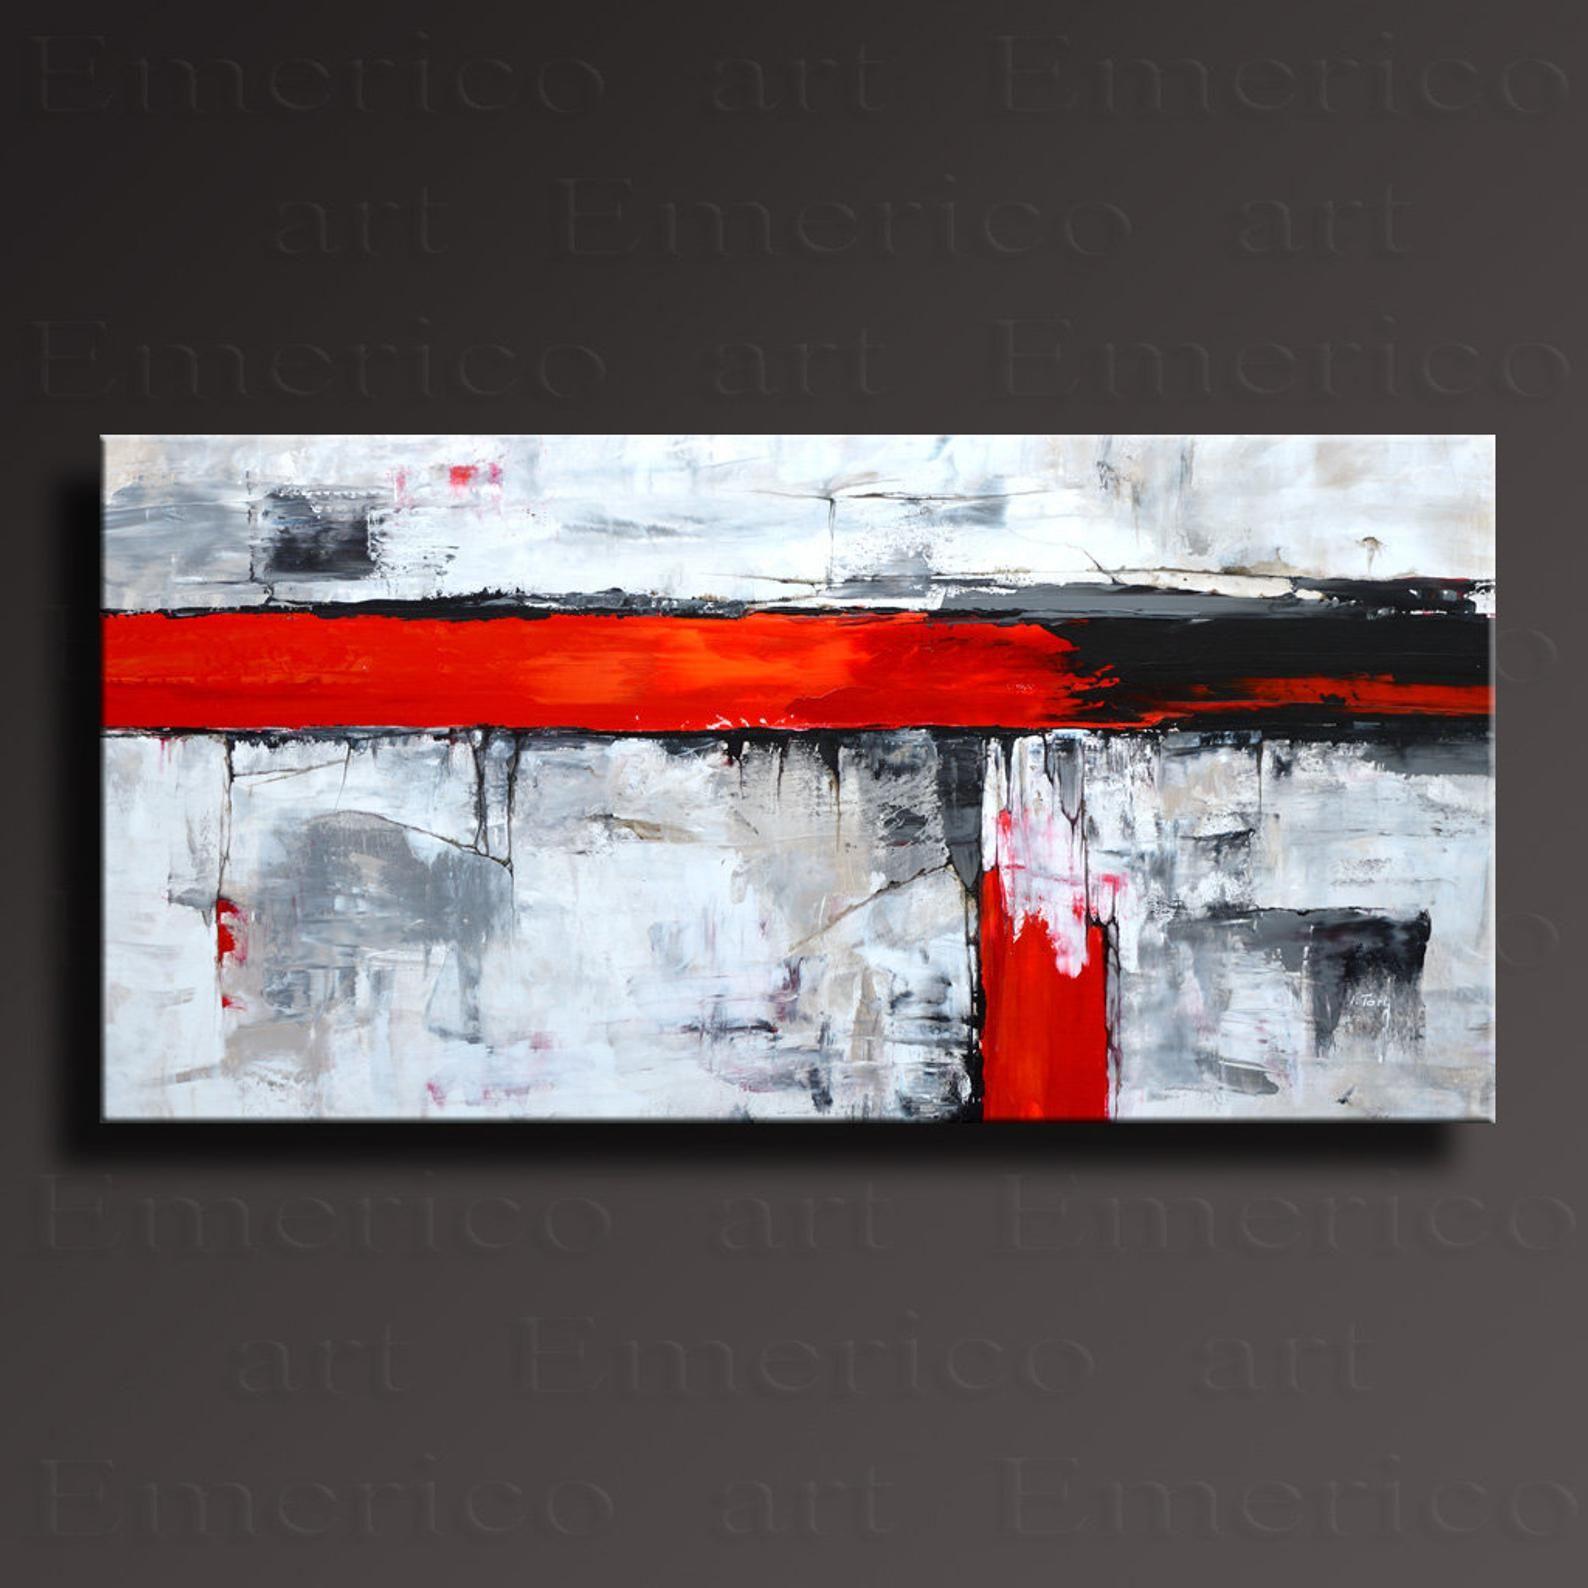 48 original abstract painting black white gray red on canvas contemporary modern art wall decor ab58i3f abstrakte malerei moderne kunst abstrakt bilder grau weiß schwarz